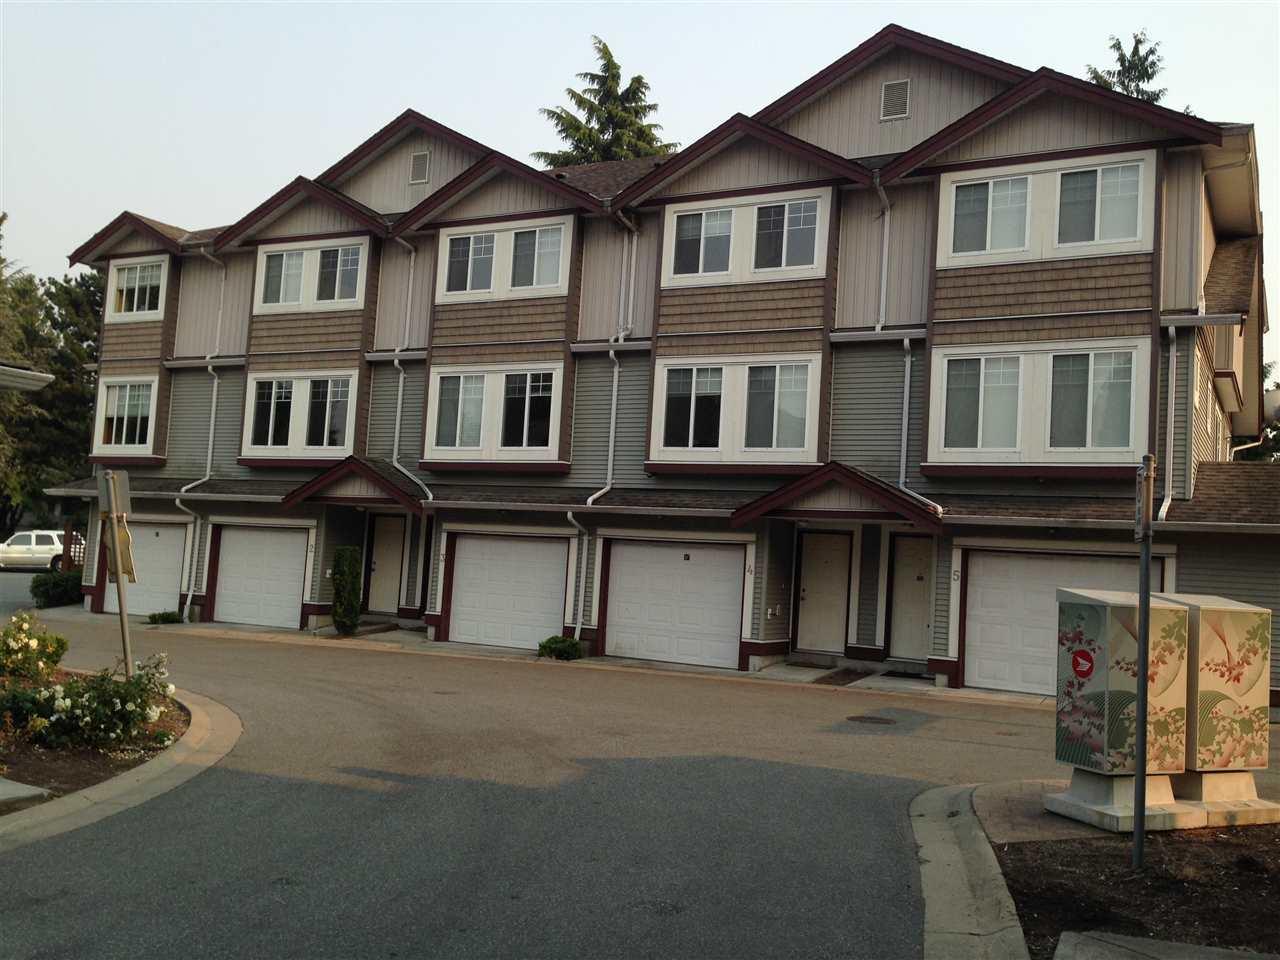 8255 120A STREET 4, Surrey, BC V3W 1T2